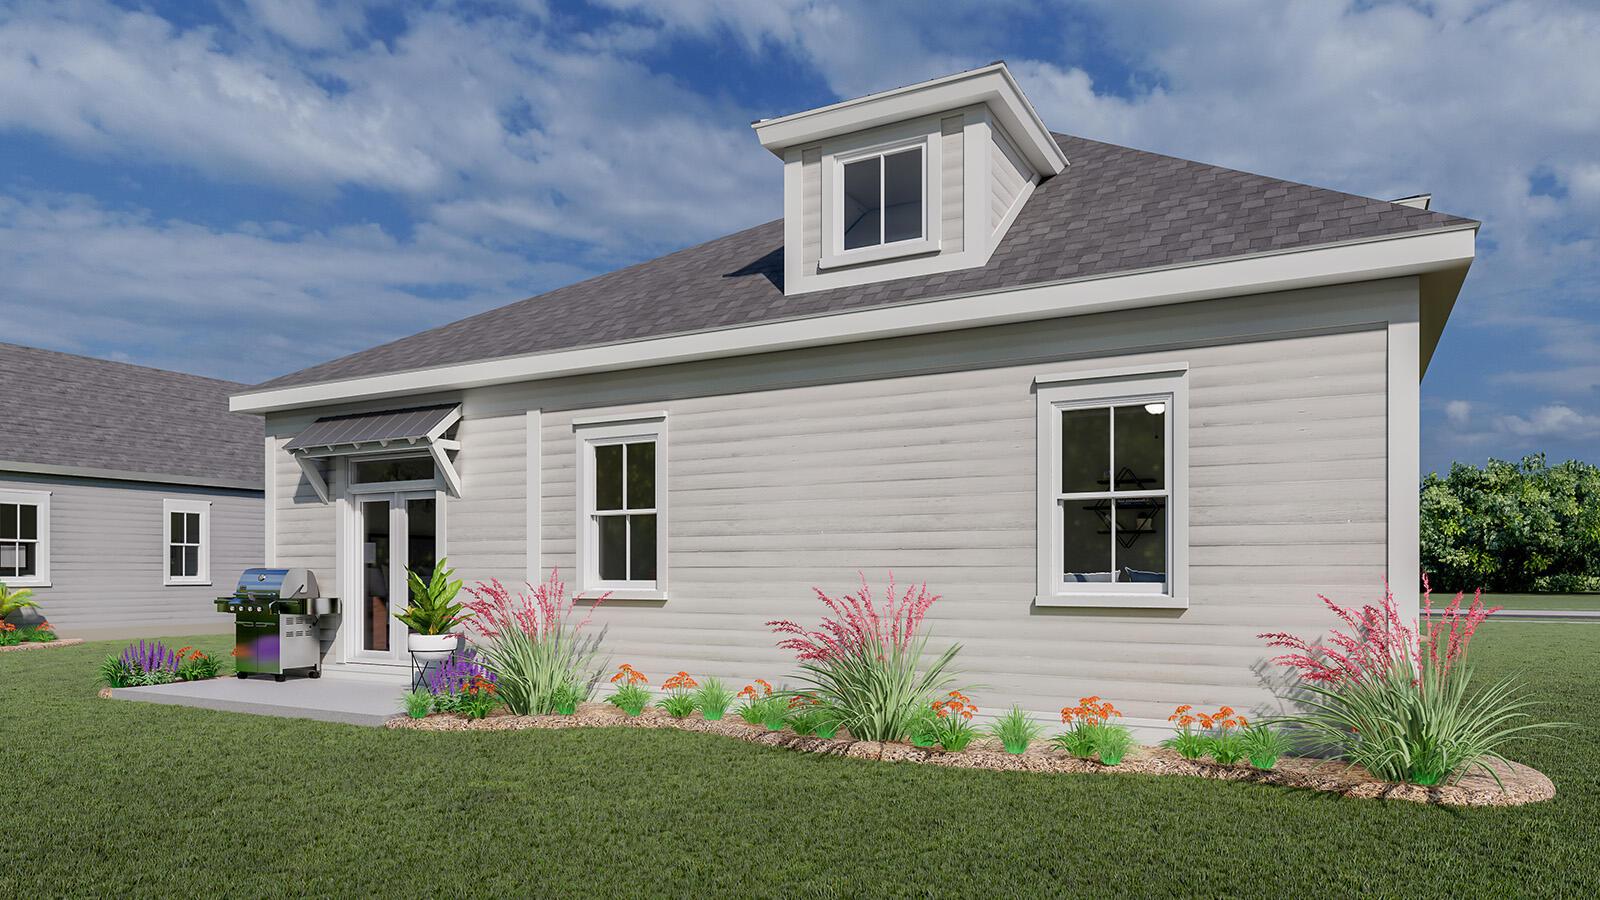 Carolina Park Homes For Sale - 3499 Habernaria, Mount Pleasant, SC - 6